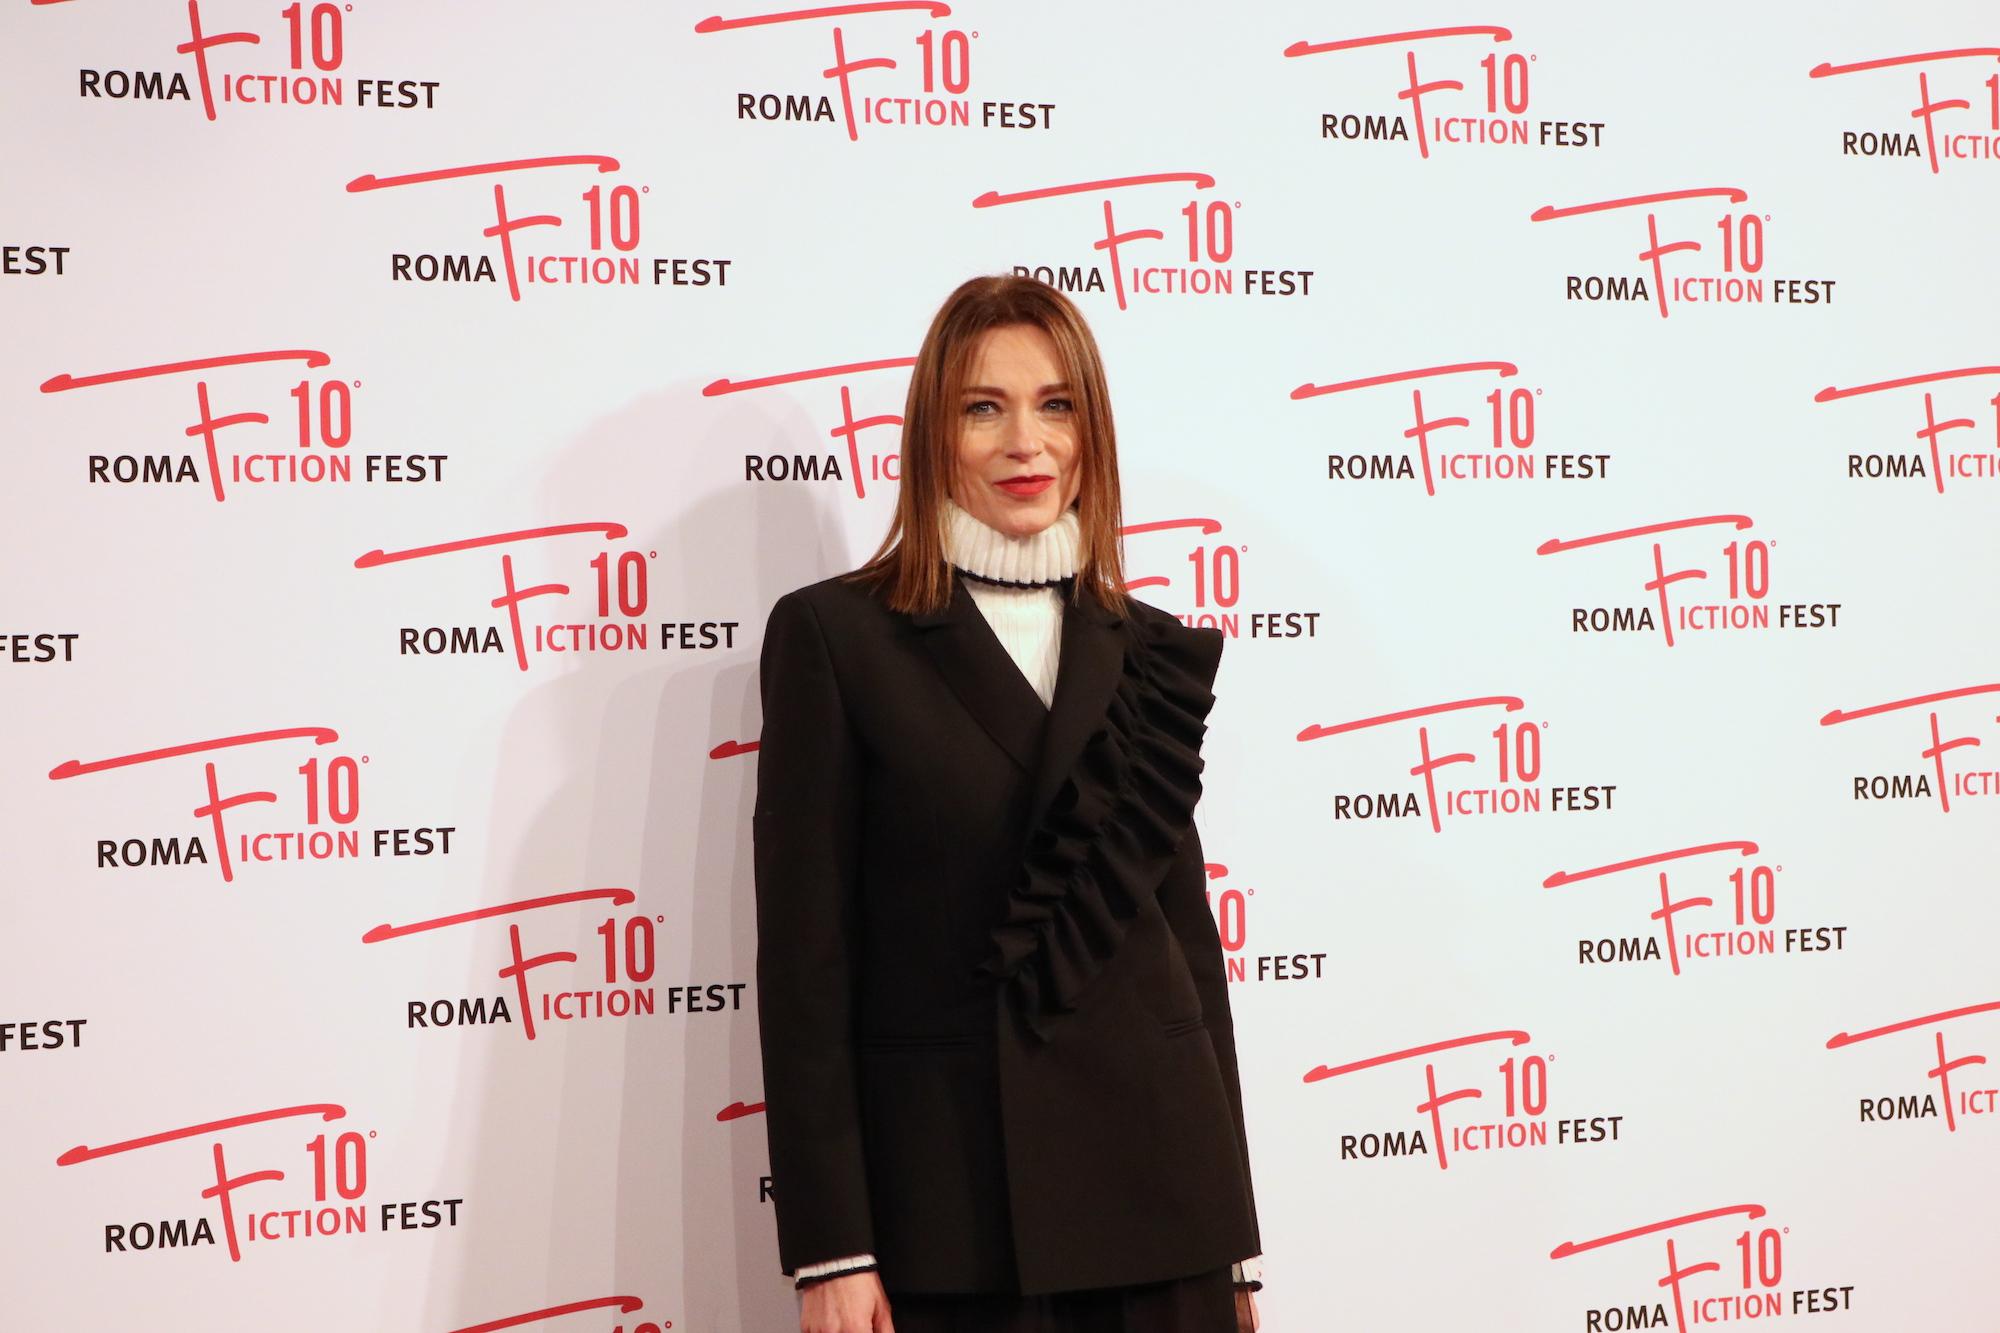 Roma Fiction Fest 2016: Stefania Rocca sul red carpet di Di padre in figlia